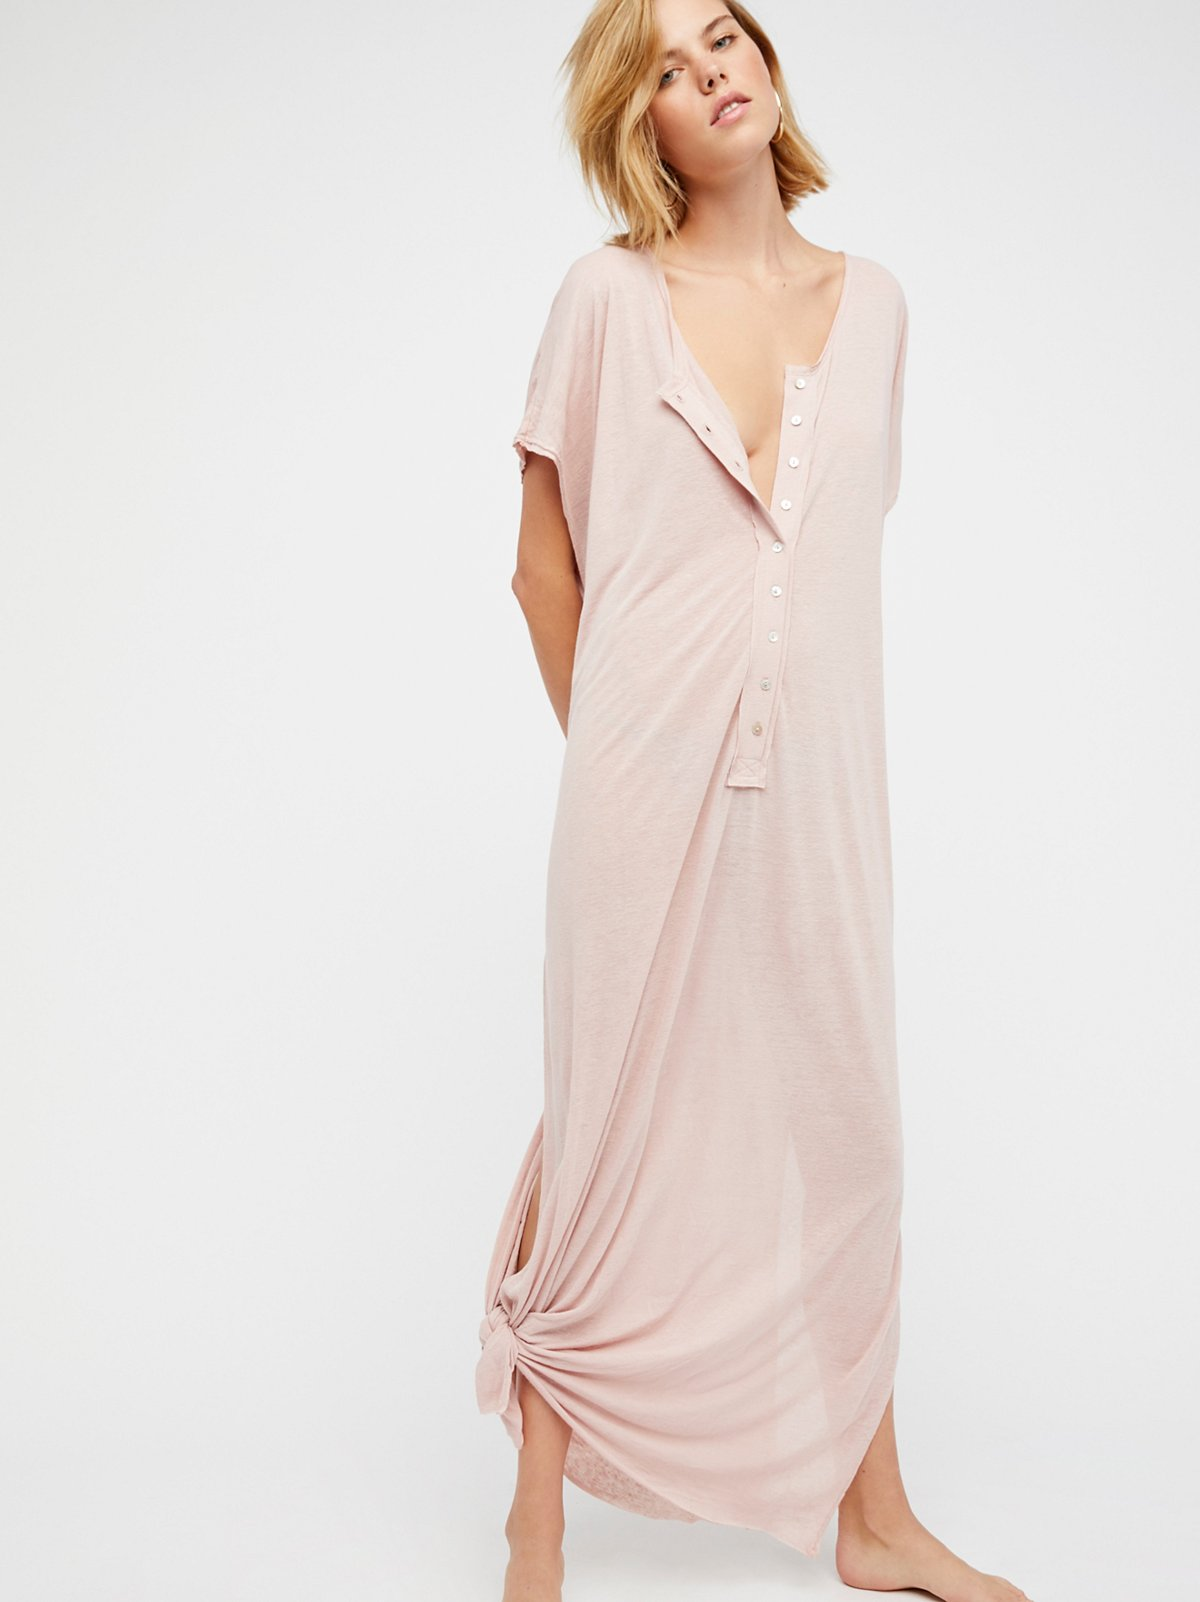 New Marrakesh Maxi Dress